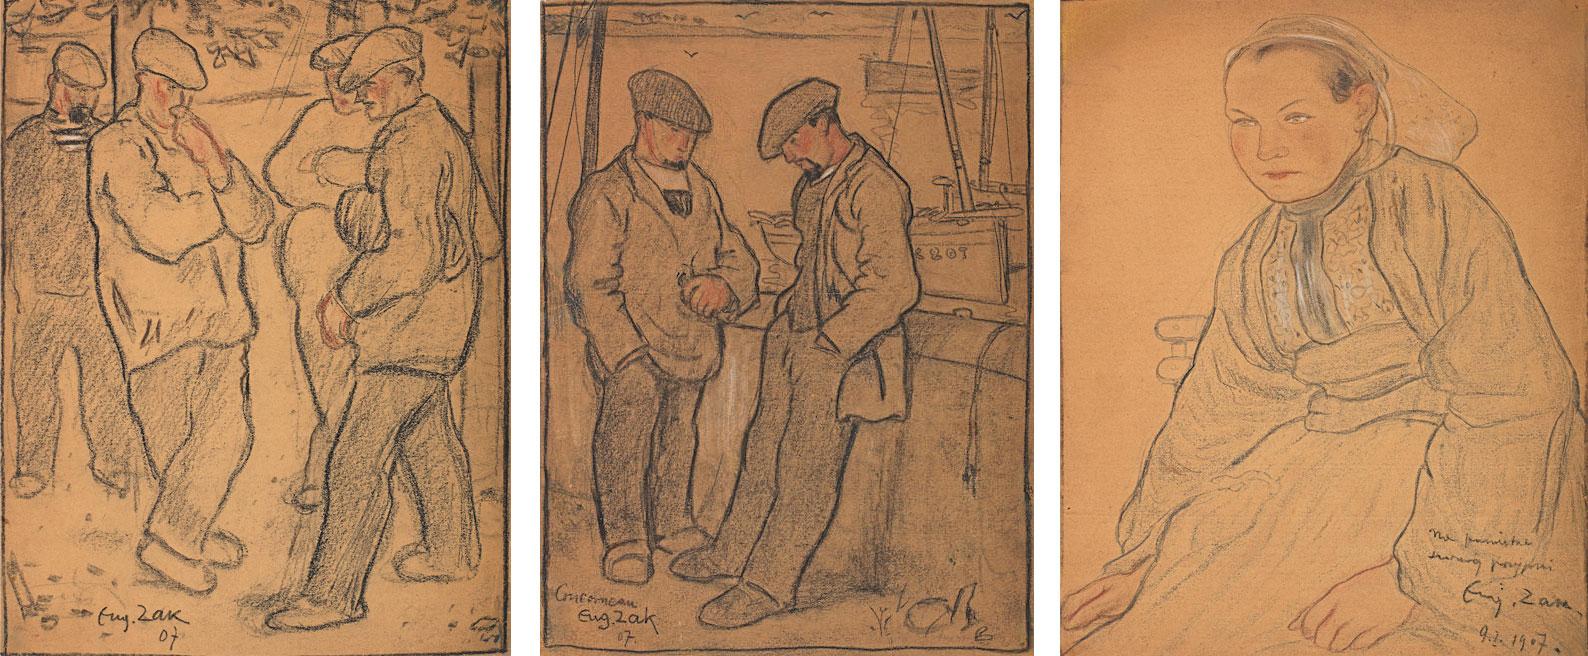 Eugeniusz Zak (1884-1926) Zestaw 3 prac z Bretanii, 1907 rok, źródło: Bonhams